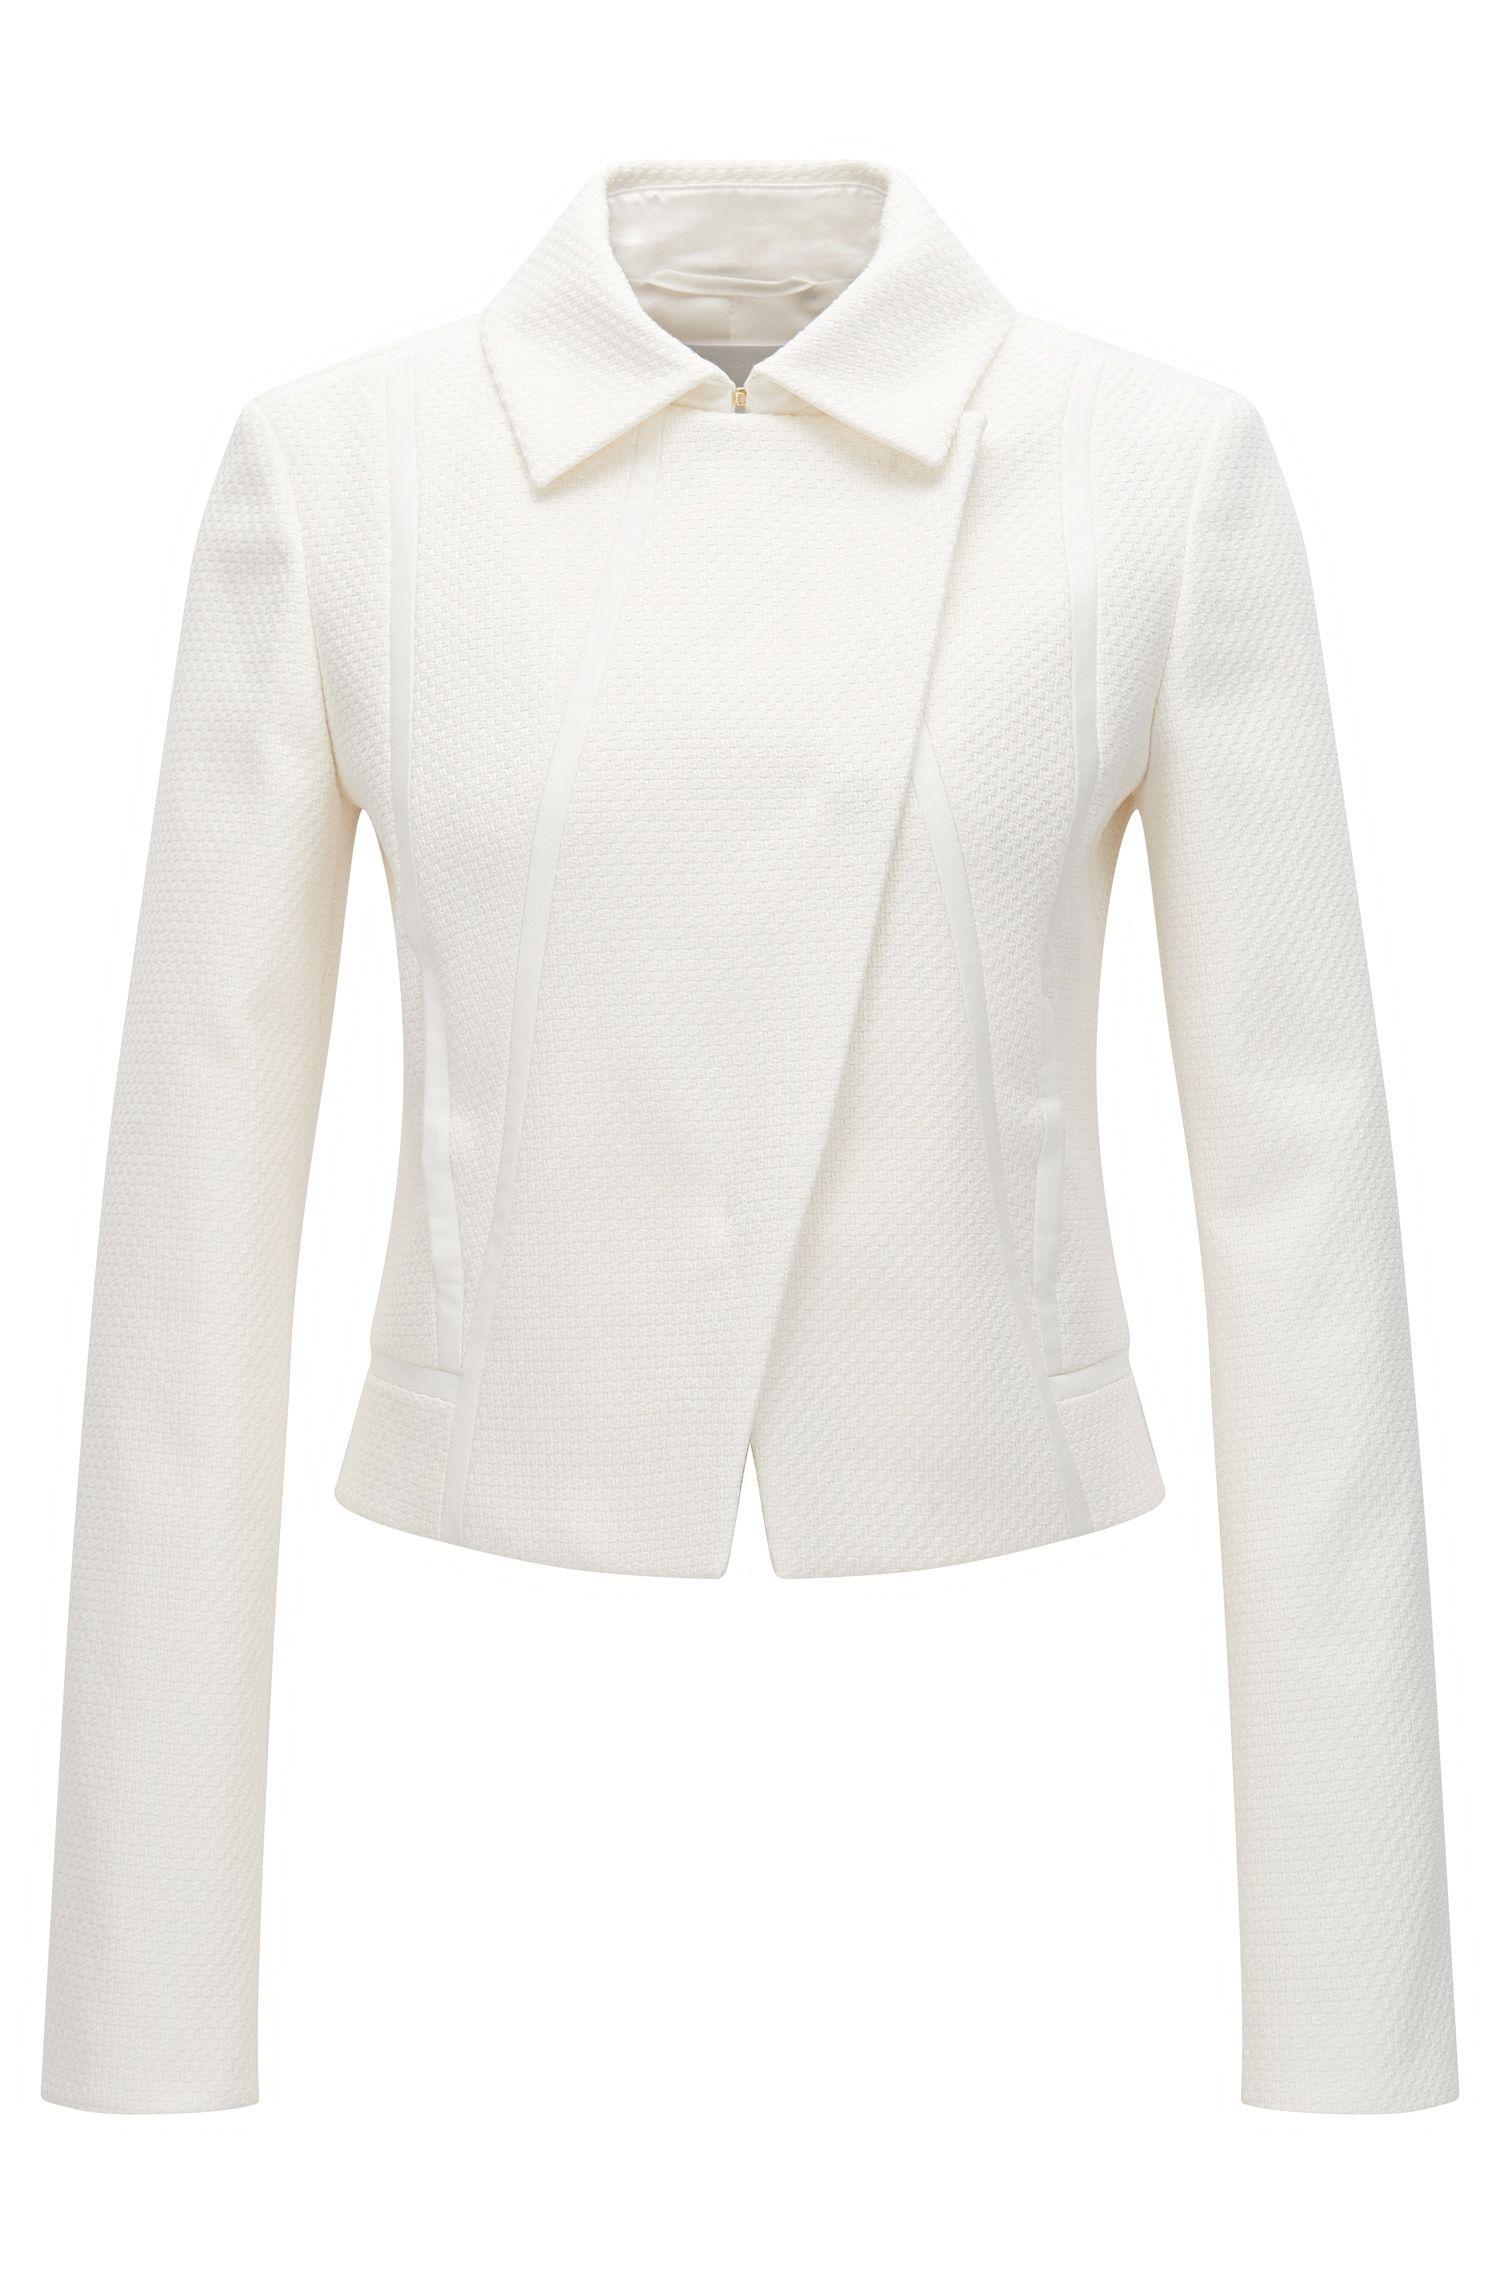 'Jabina' | Stretch Cotton Blend Textured Jacket